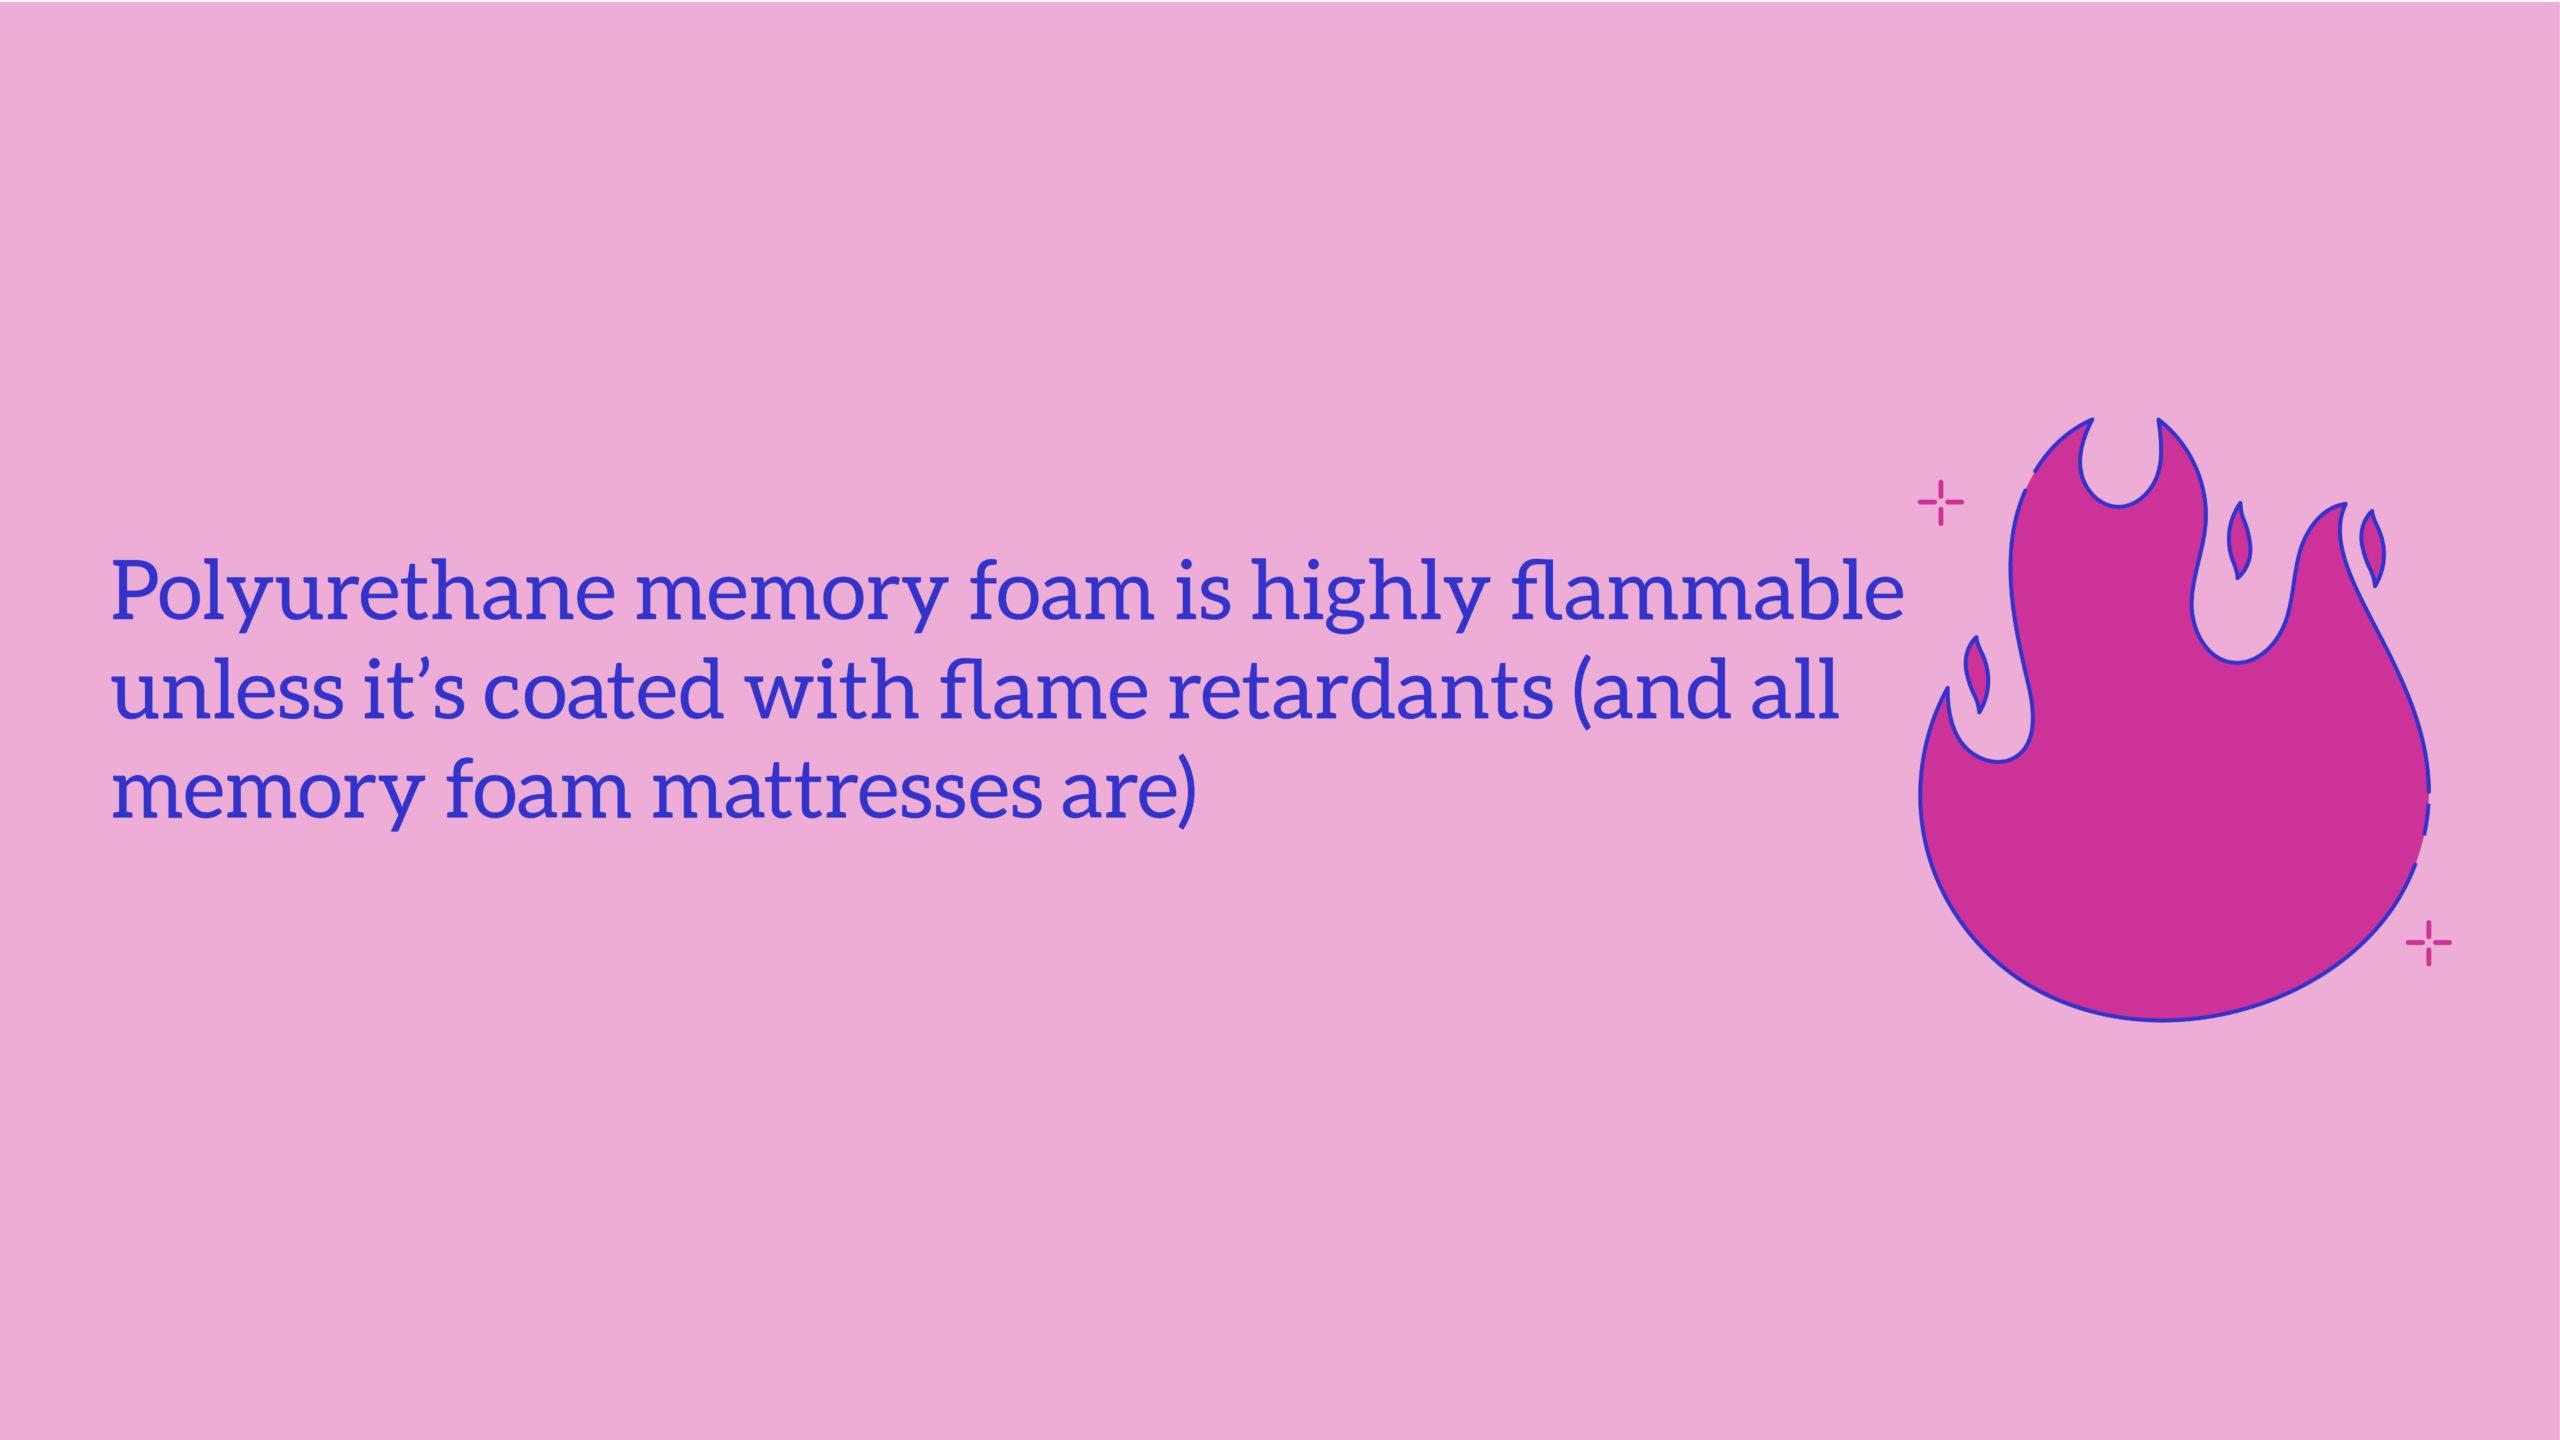 are-memory-foam-mattresses-safe